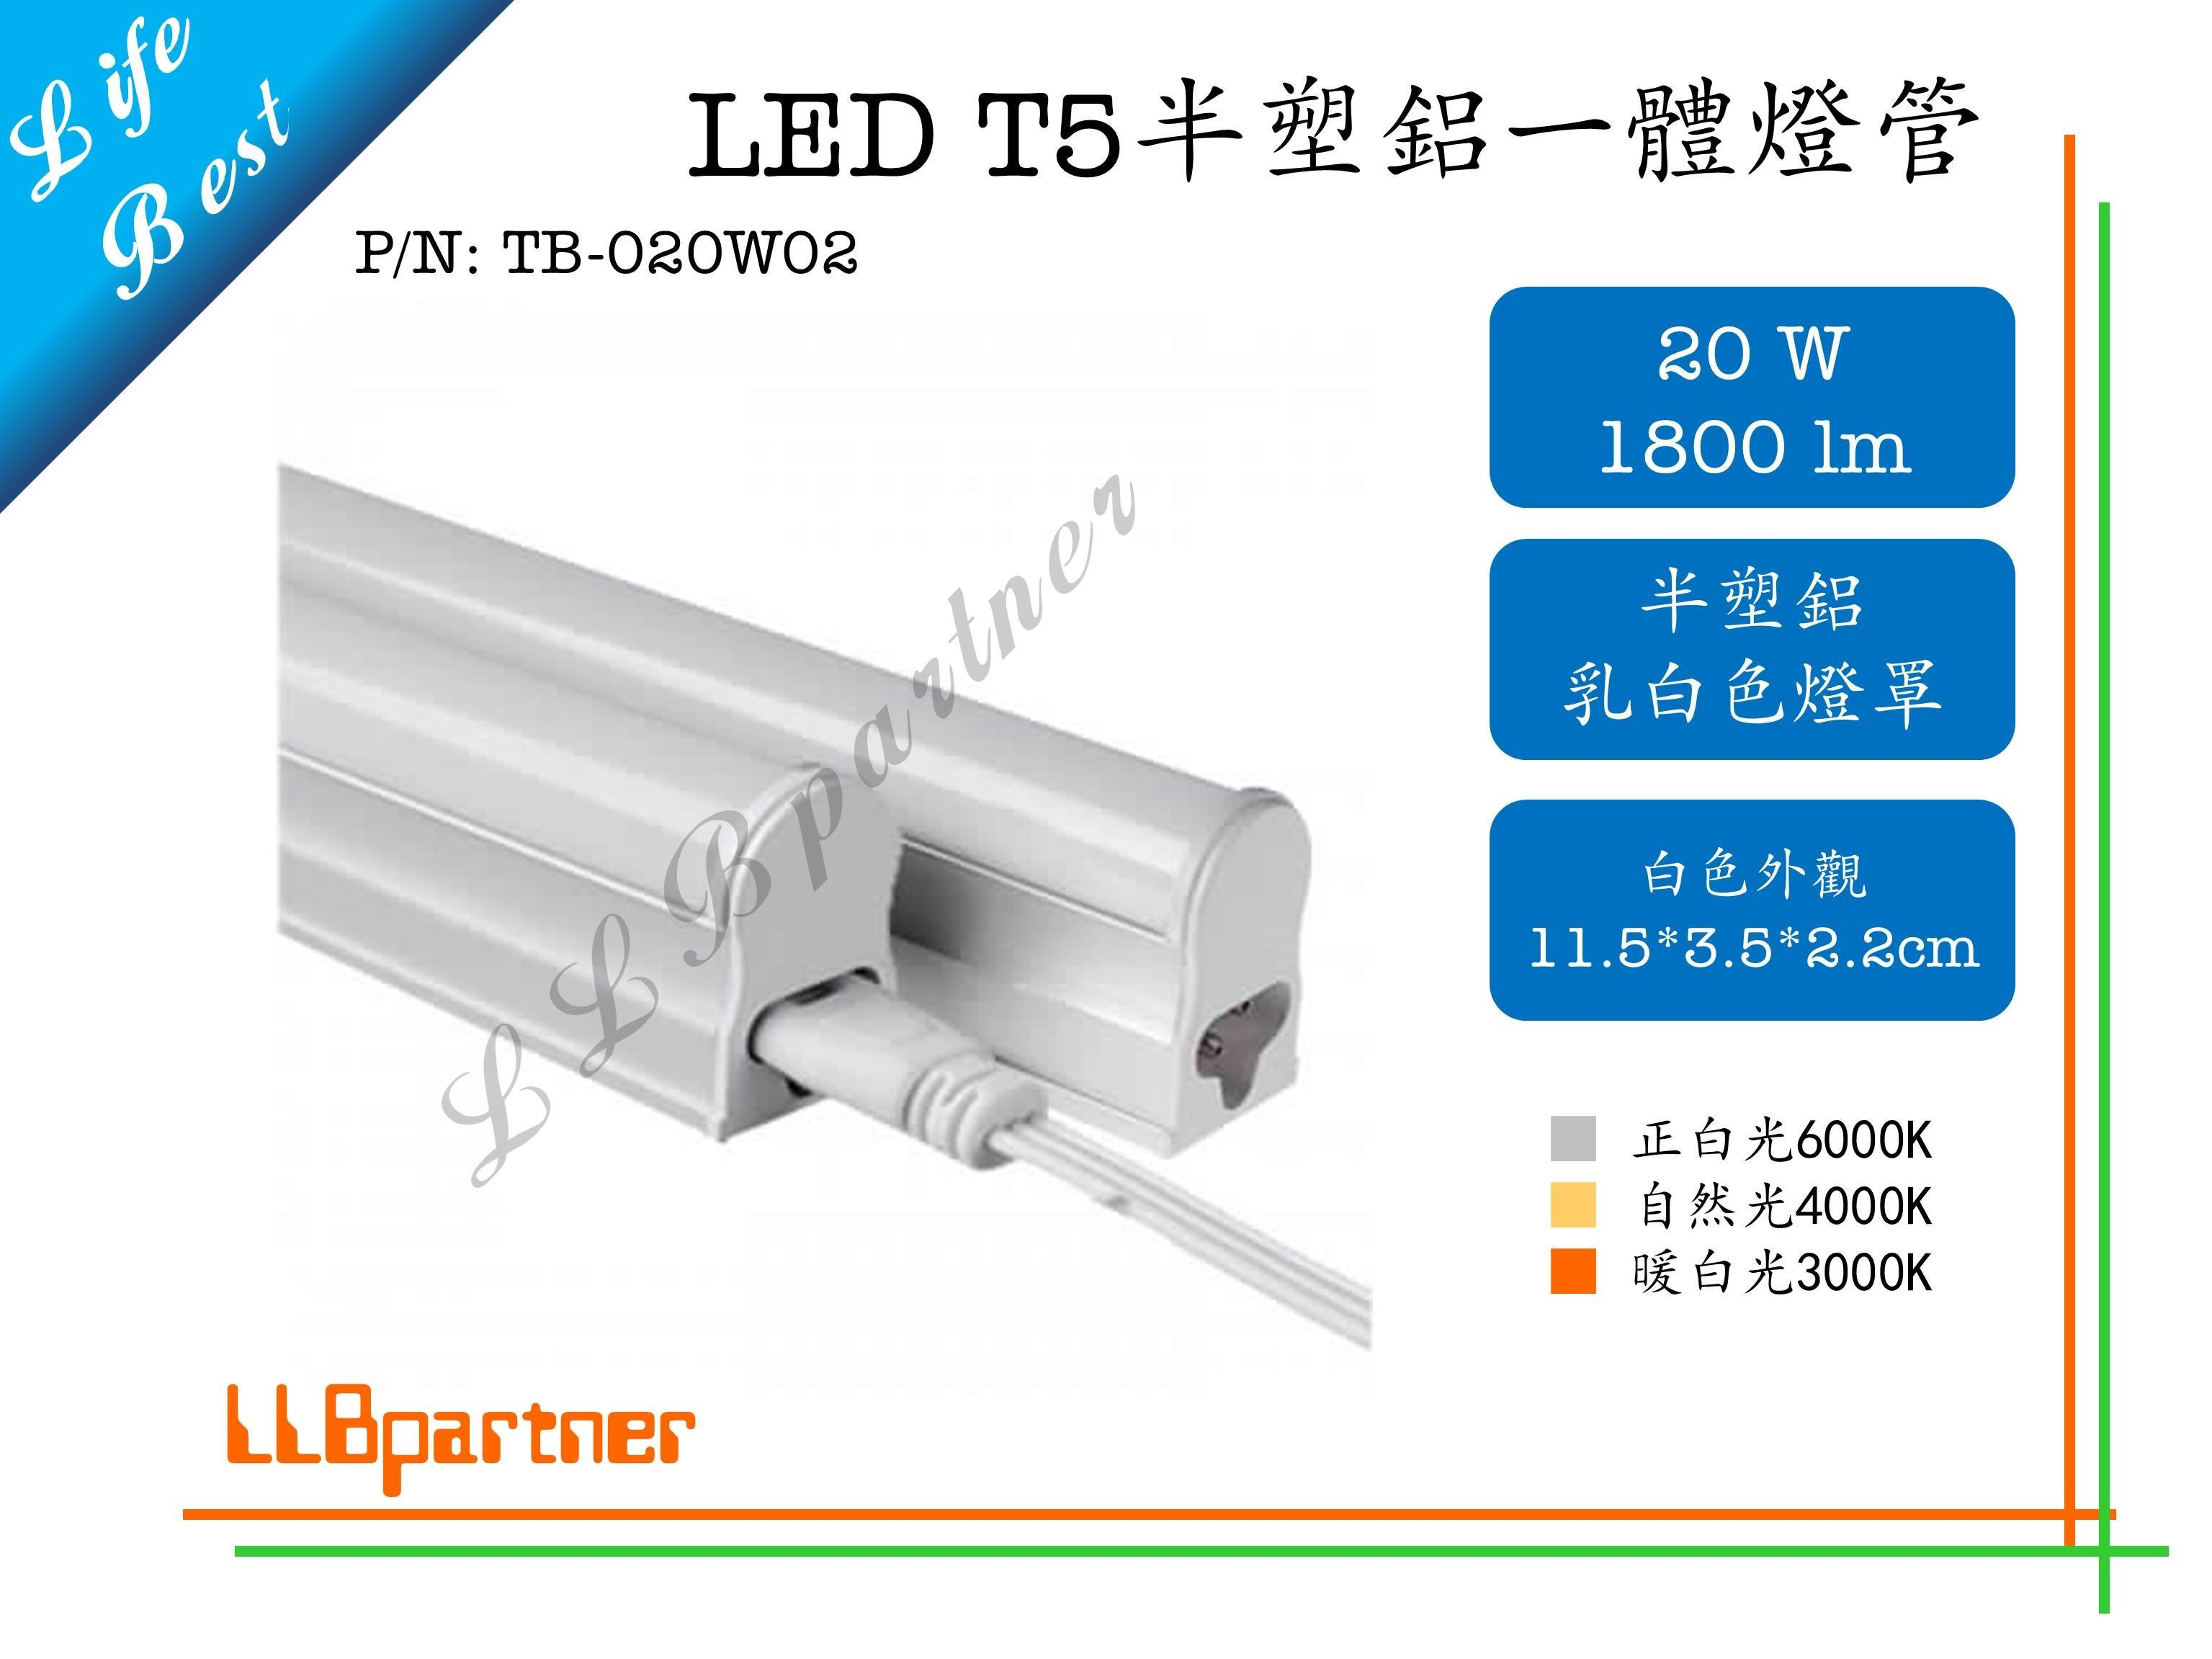 *TB-020W02* LED 20W T5一體 4尺 120cm 乳白罩 串接燈 層板燈 燈管 有自然光